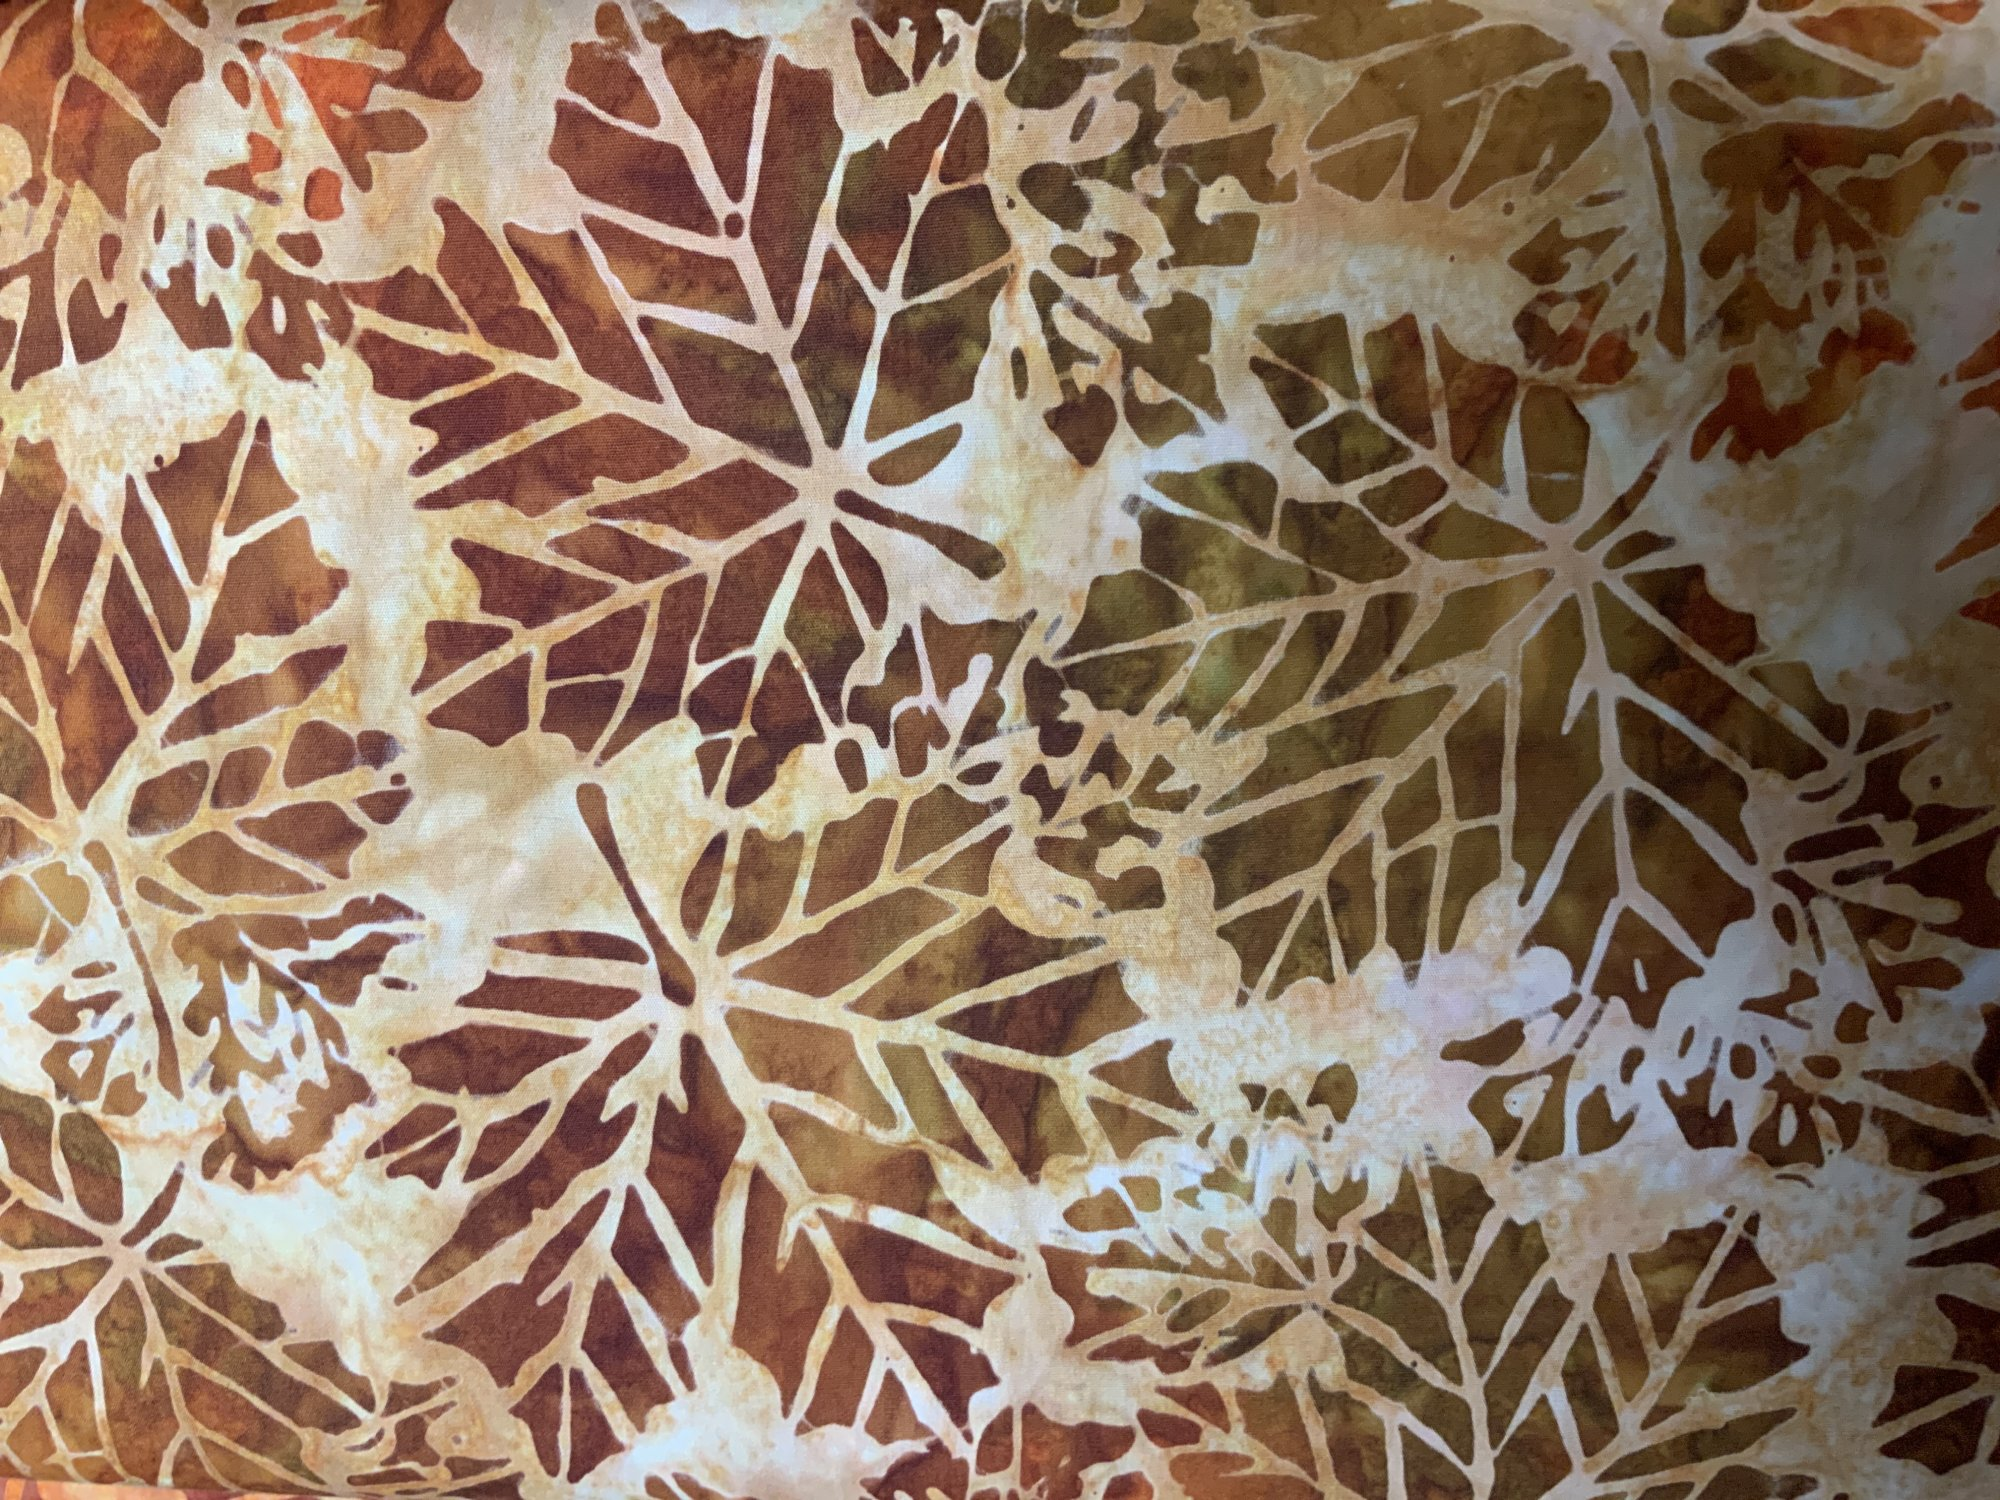 Cornucopia - Large Rust/Brown Leaves on Tan Batik